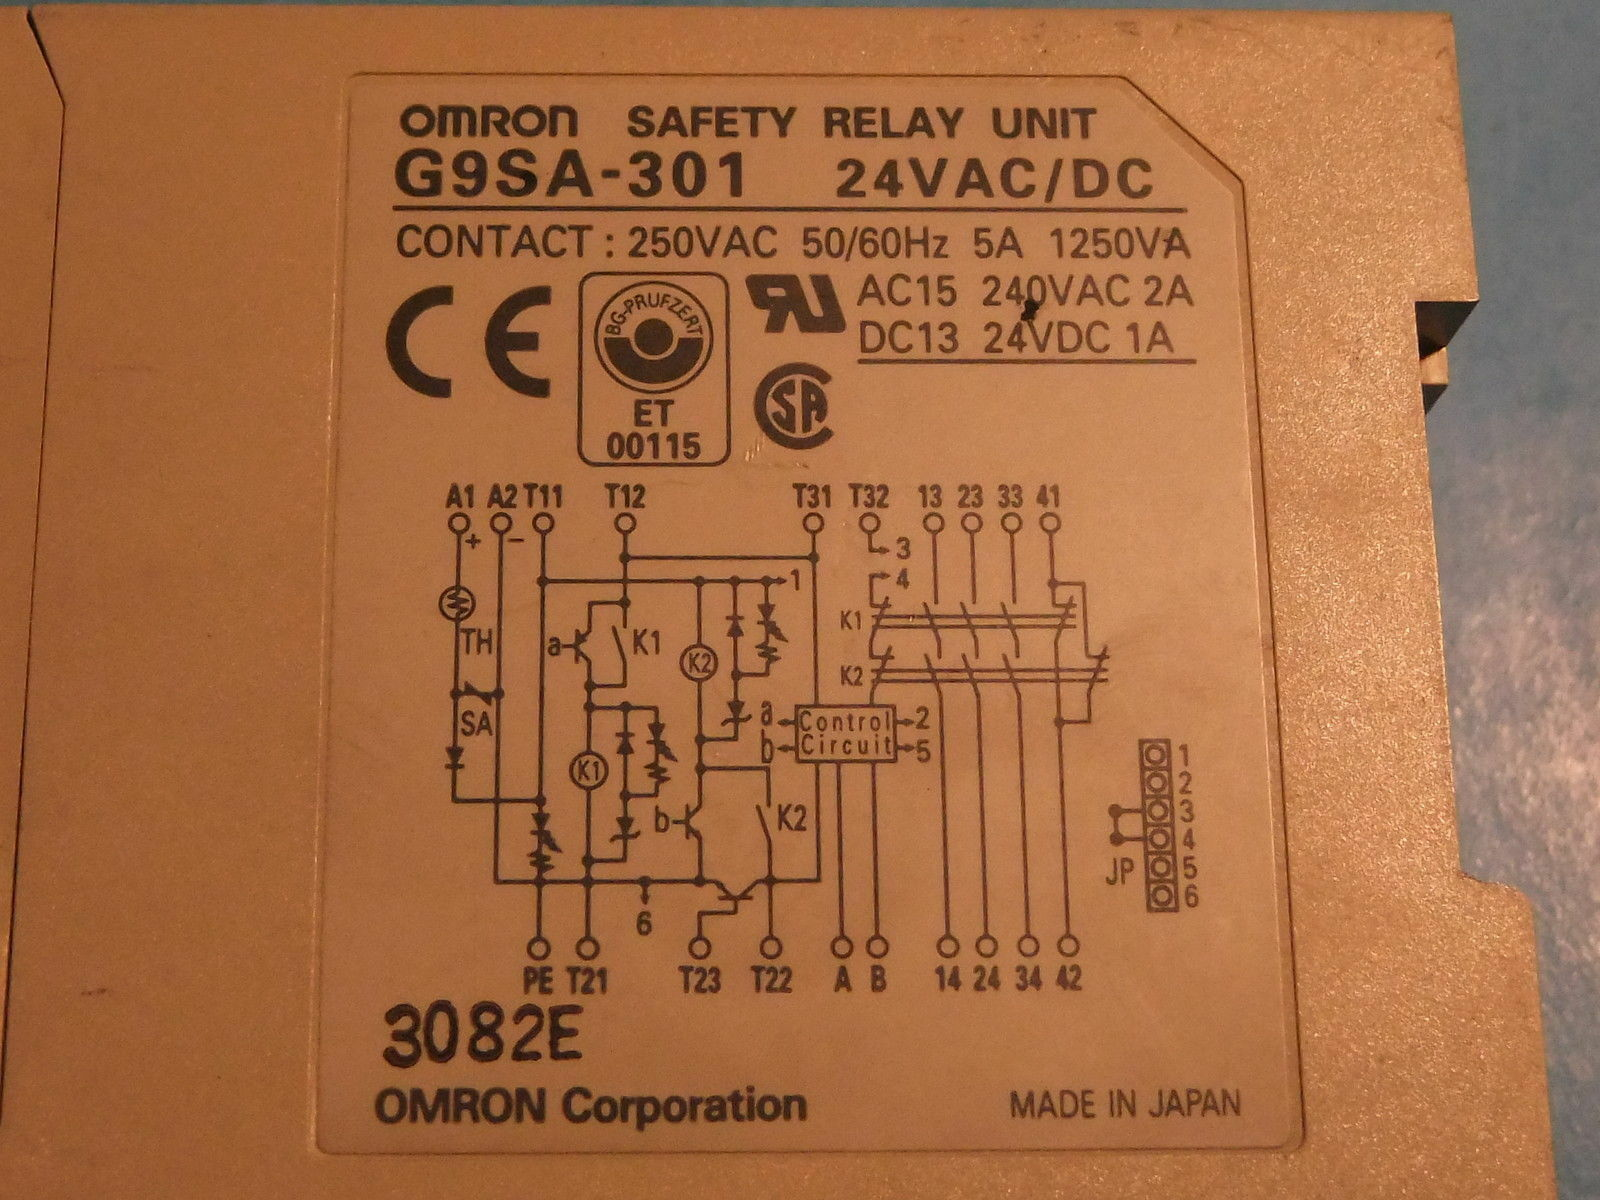 Omron G9sa-301 24vac/dc Safety Relay Unit #fy03 on